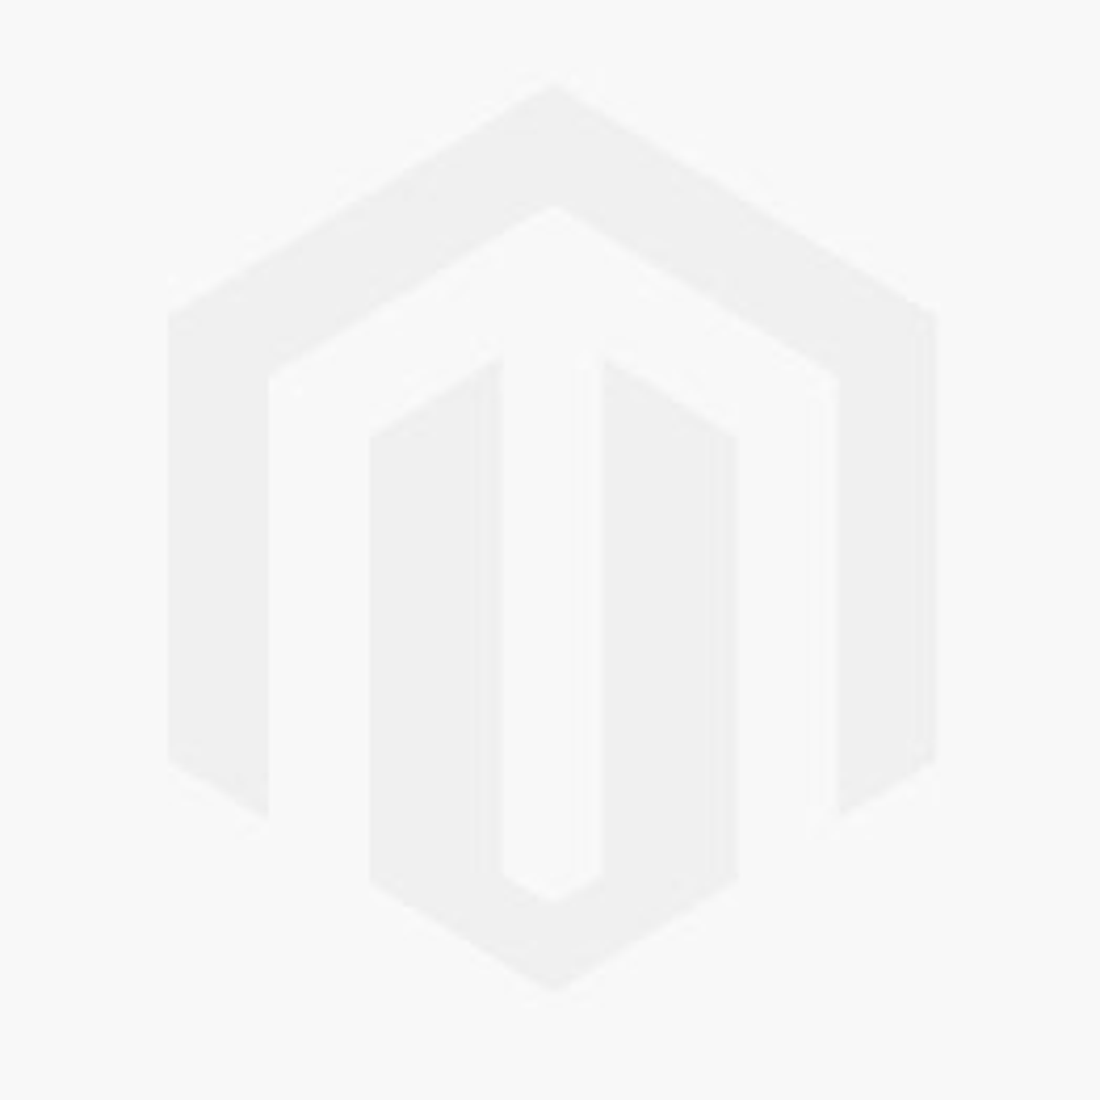 Albert Irvin OBE RA Untitled opus w.39